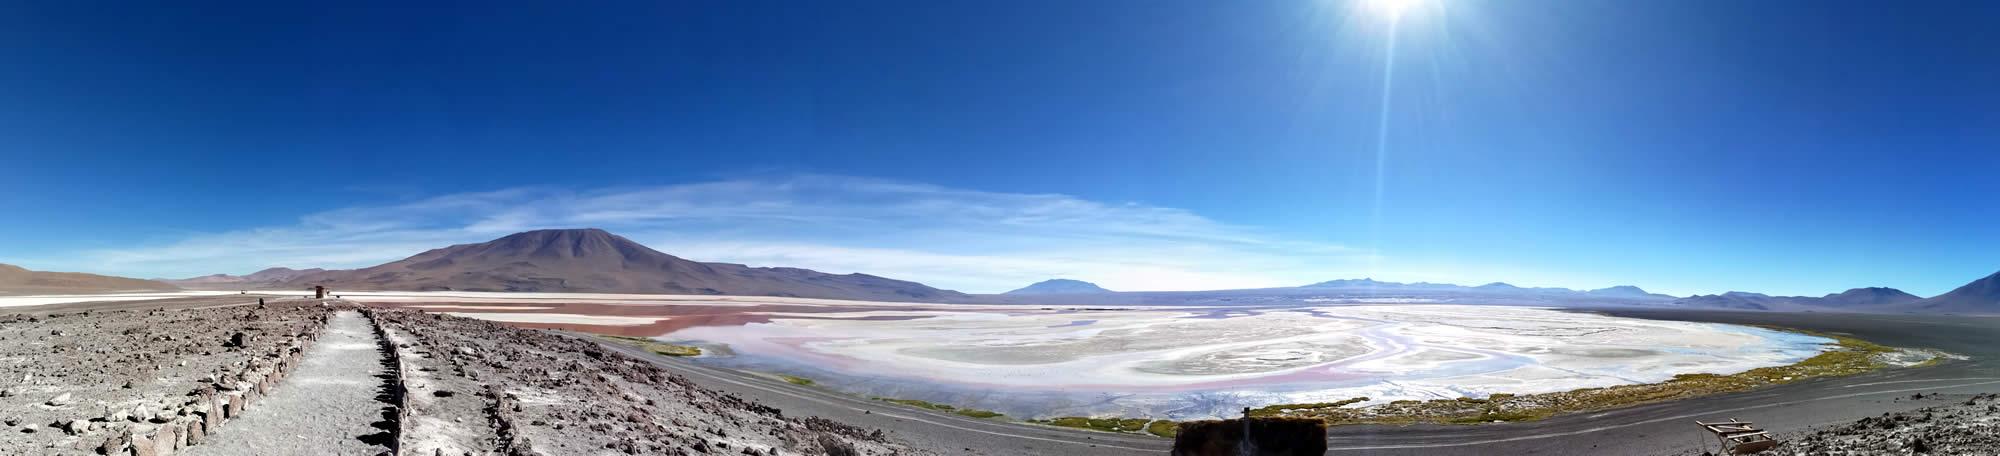 Red Lagoon, Laguna Colorada, Uyuni